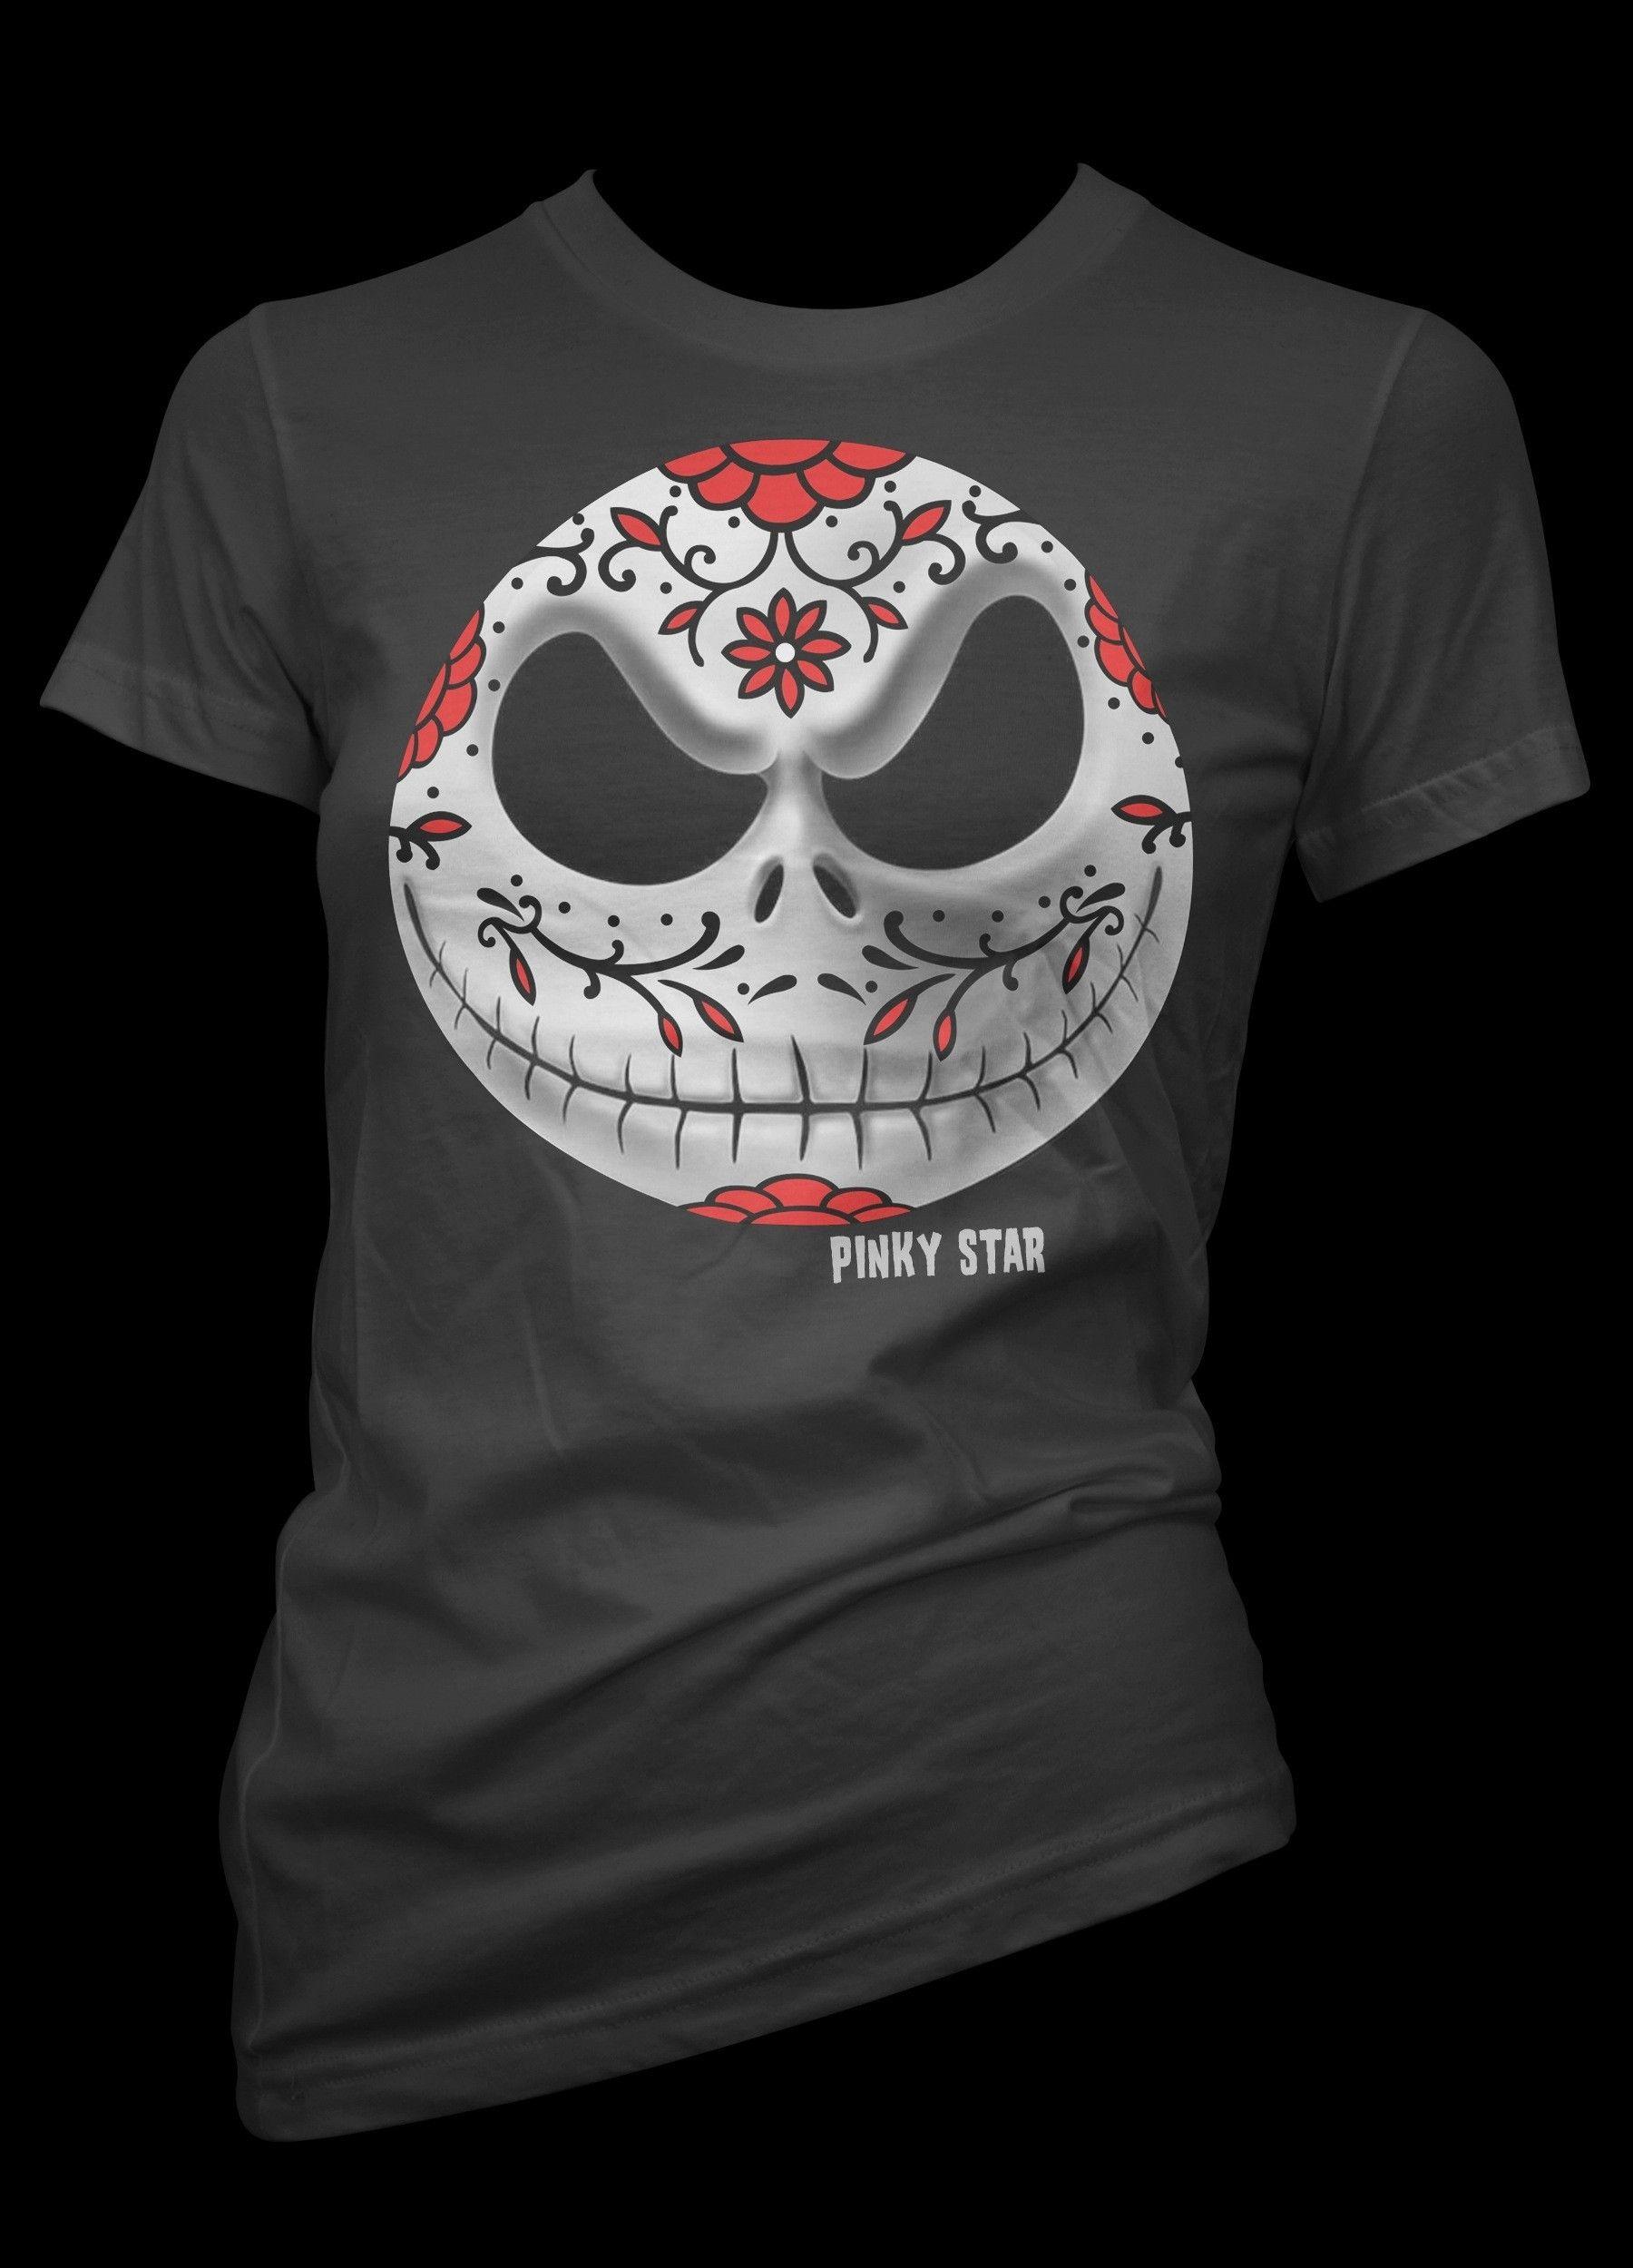 Halloween Day Of Dead Panda Tattoo Face Women/'s Racerback High Quality Shirt